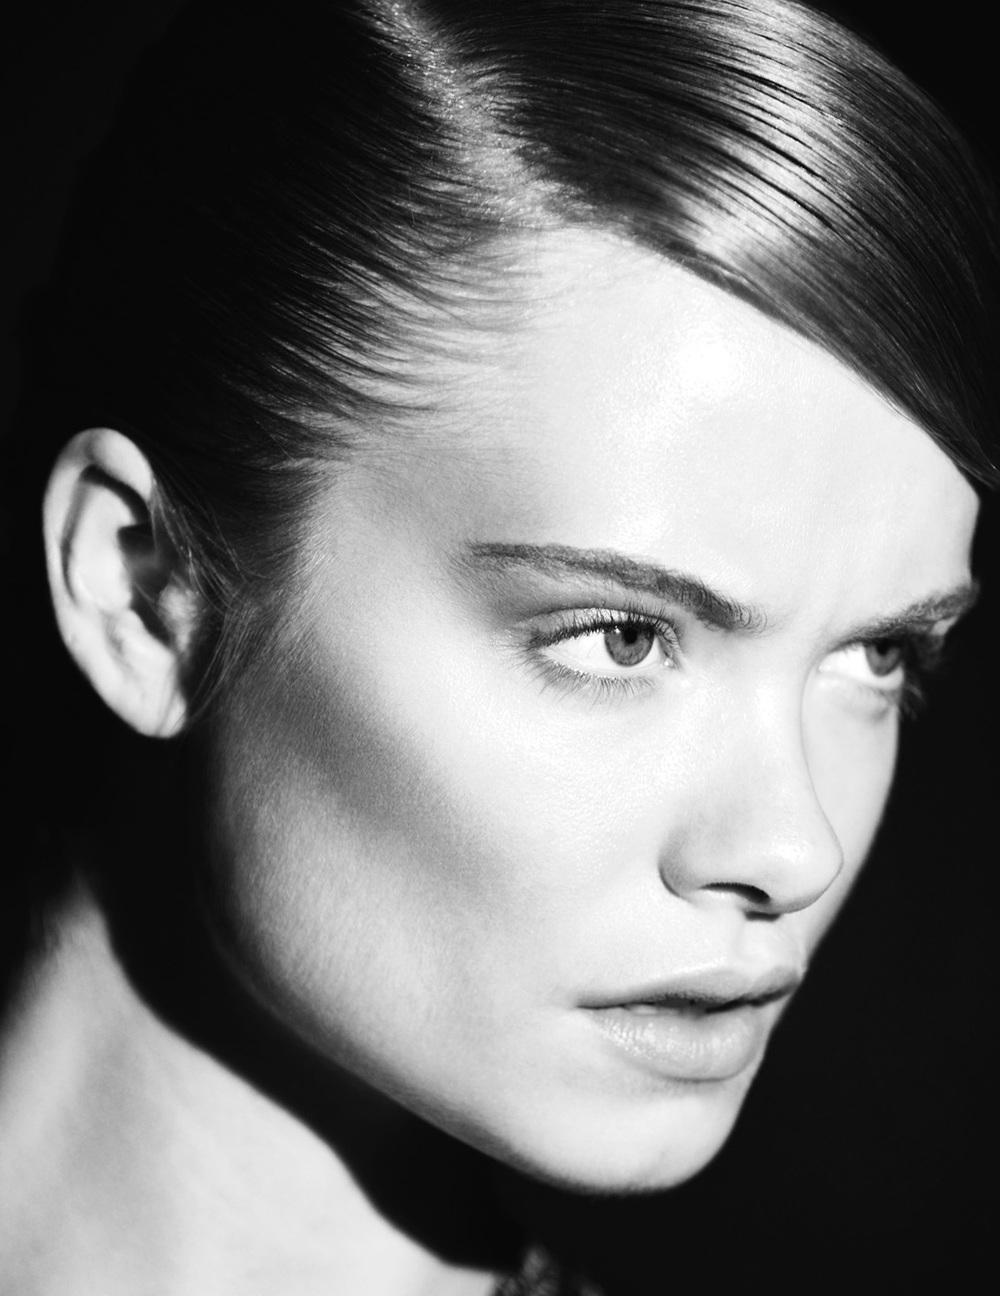 julia_kennedy_wonderland_dior_beauty_01.jpg